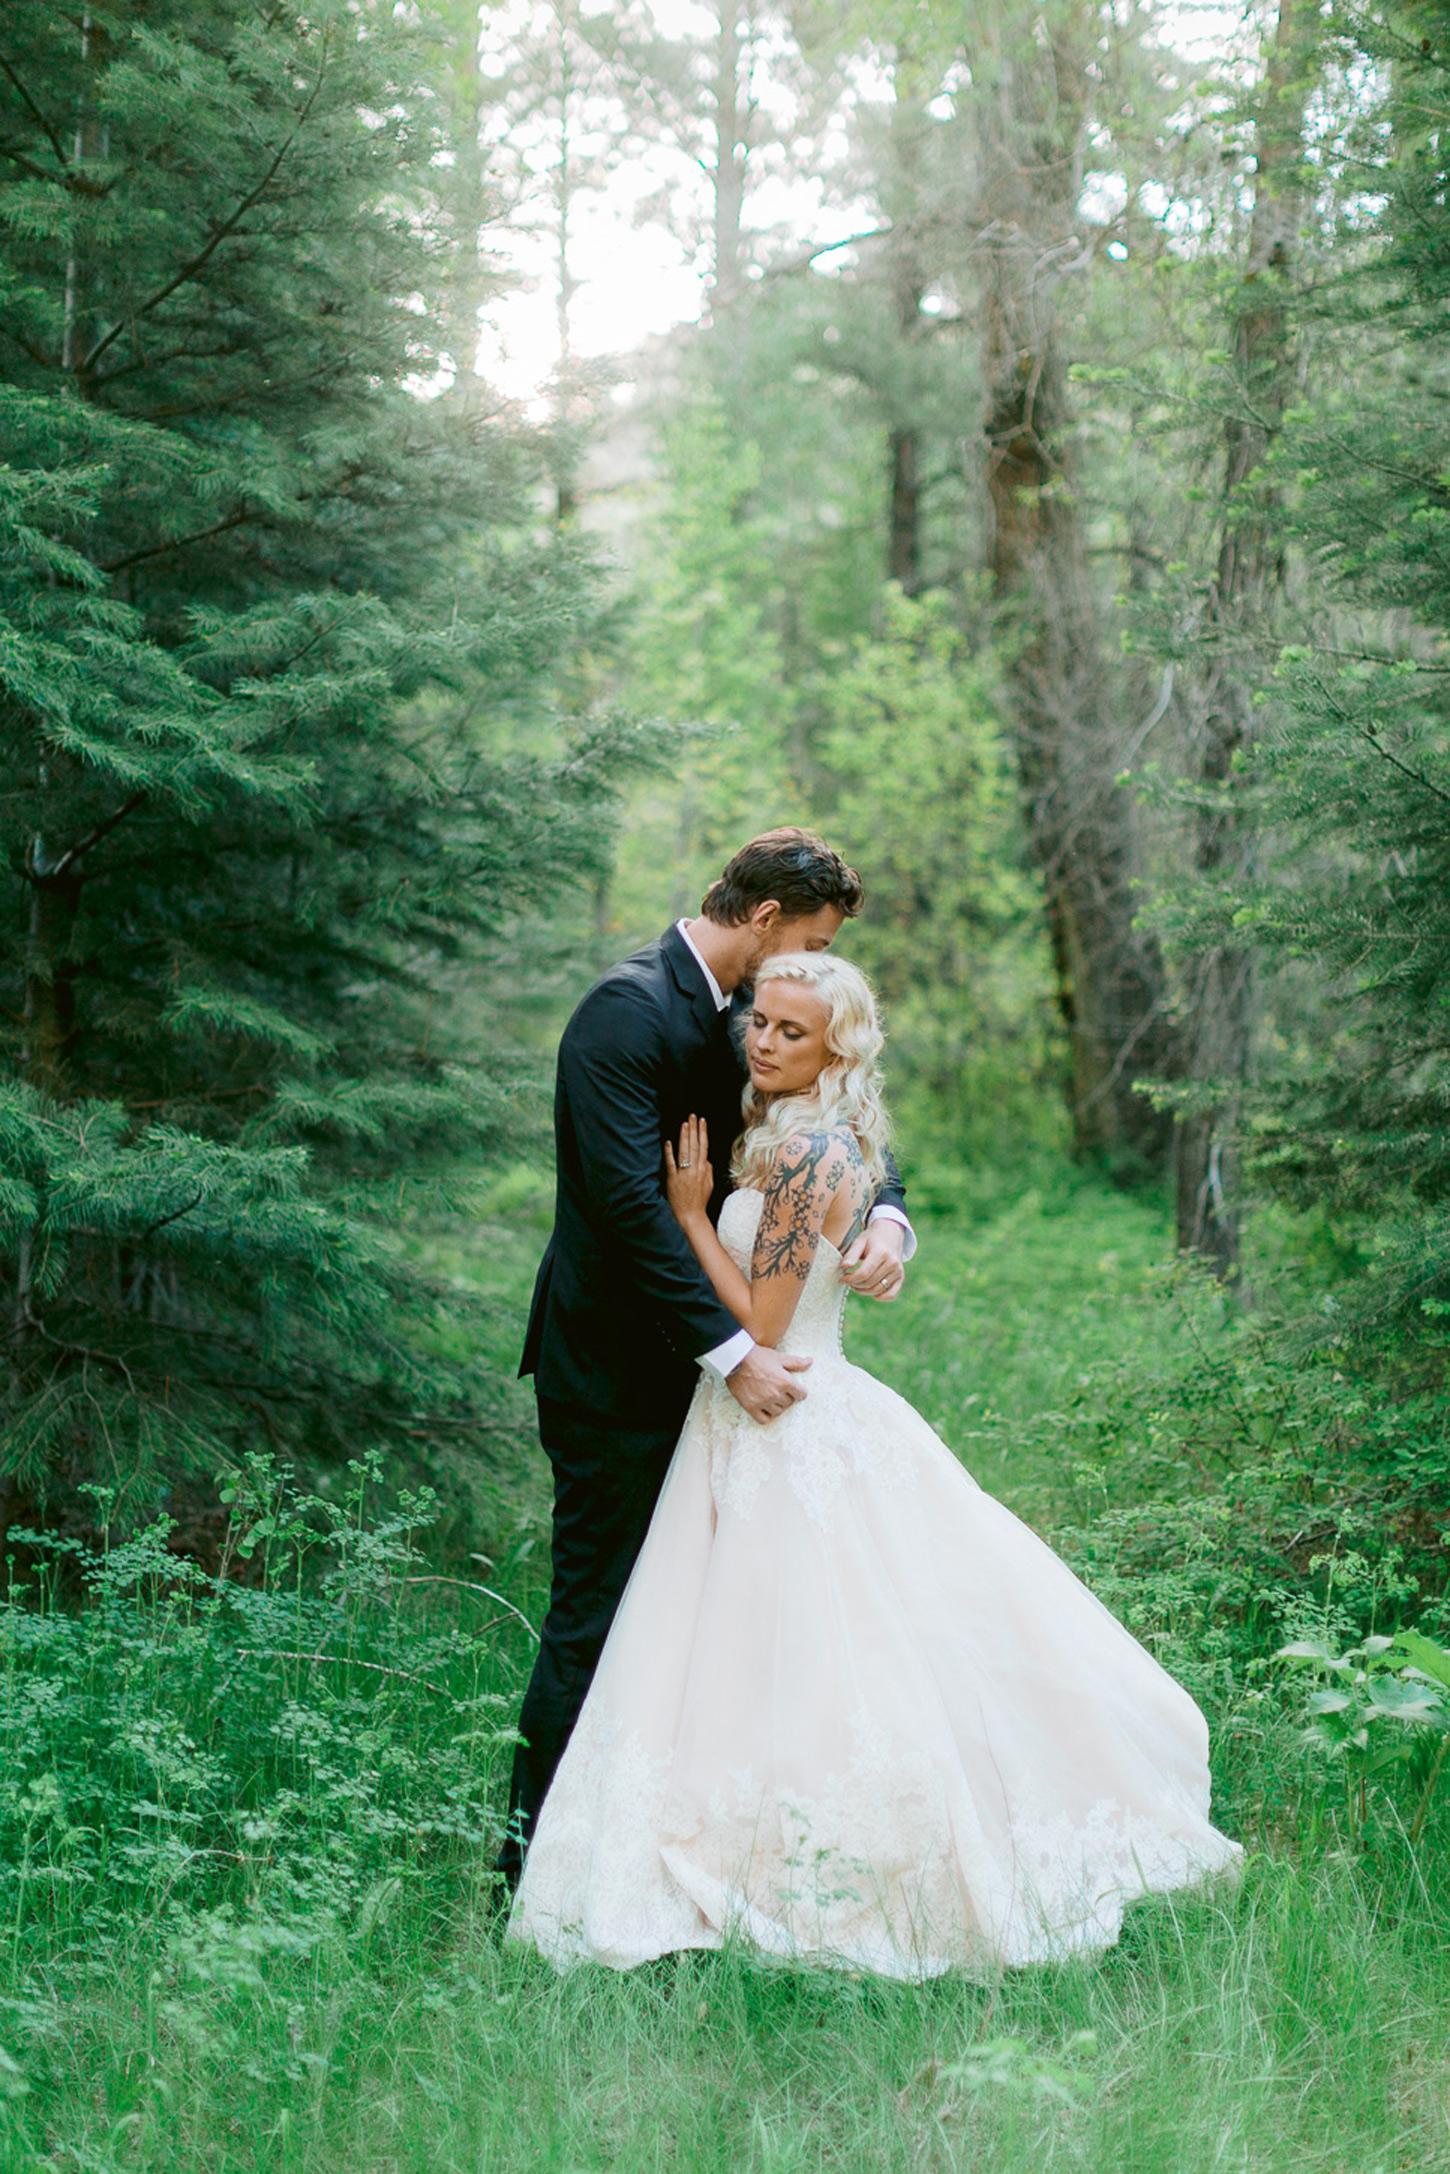 durango-intimate-family-wedding-private-ranch-036.jpg